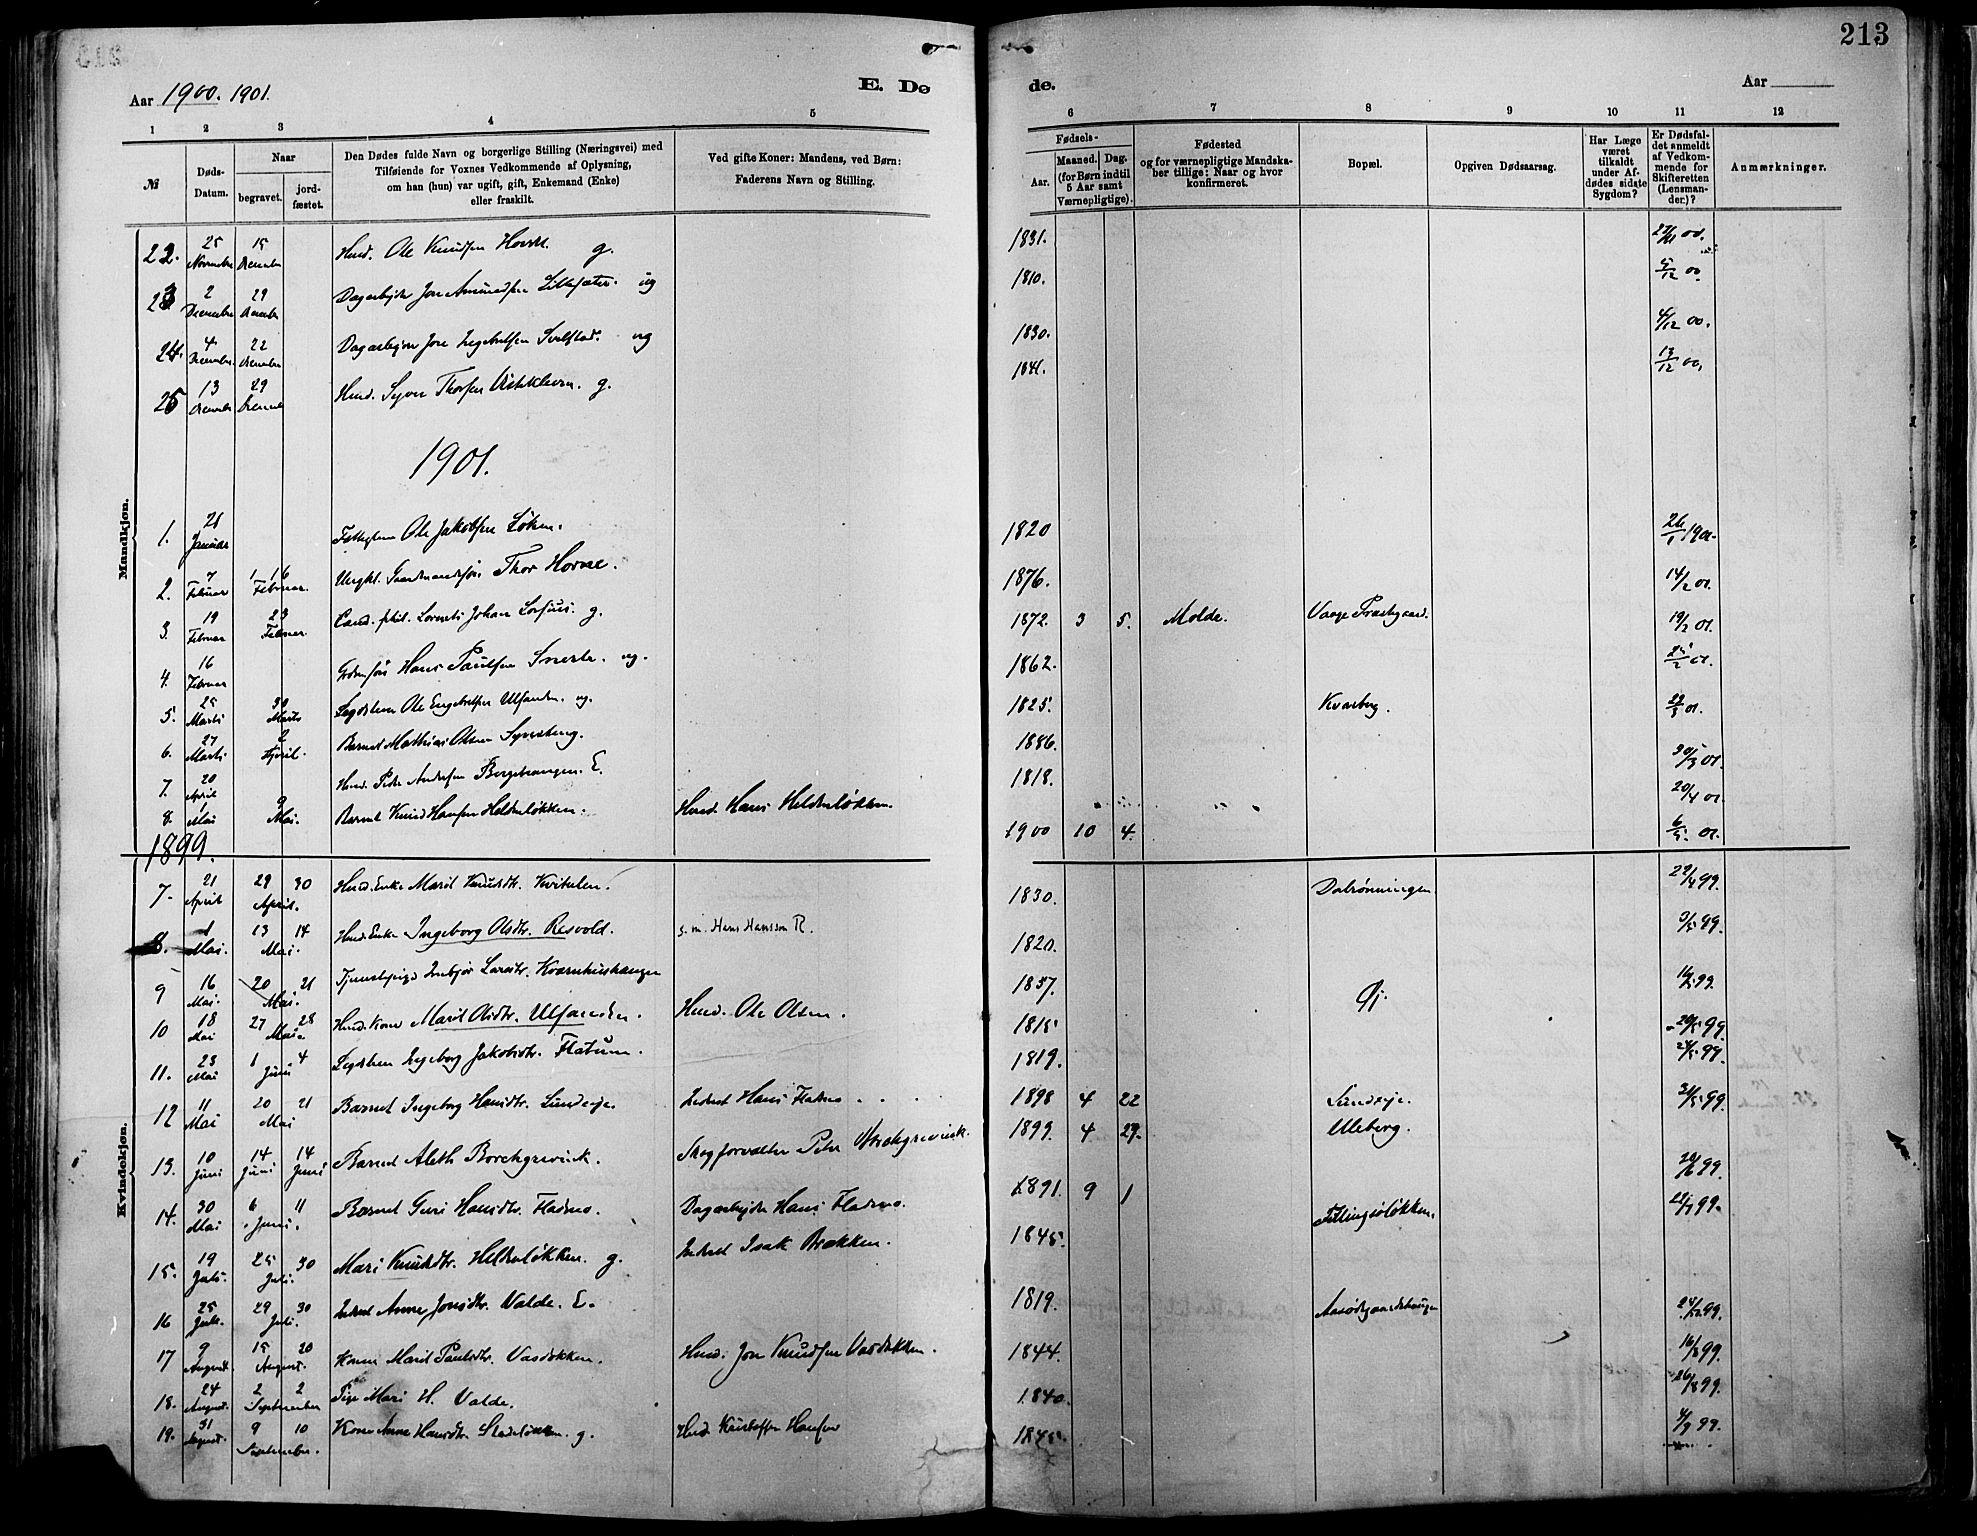 SAH, Vågå prestekontor, Ministerialbok nr. 9, 1886-1904, s. 213